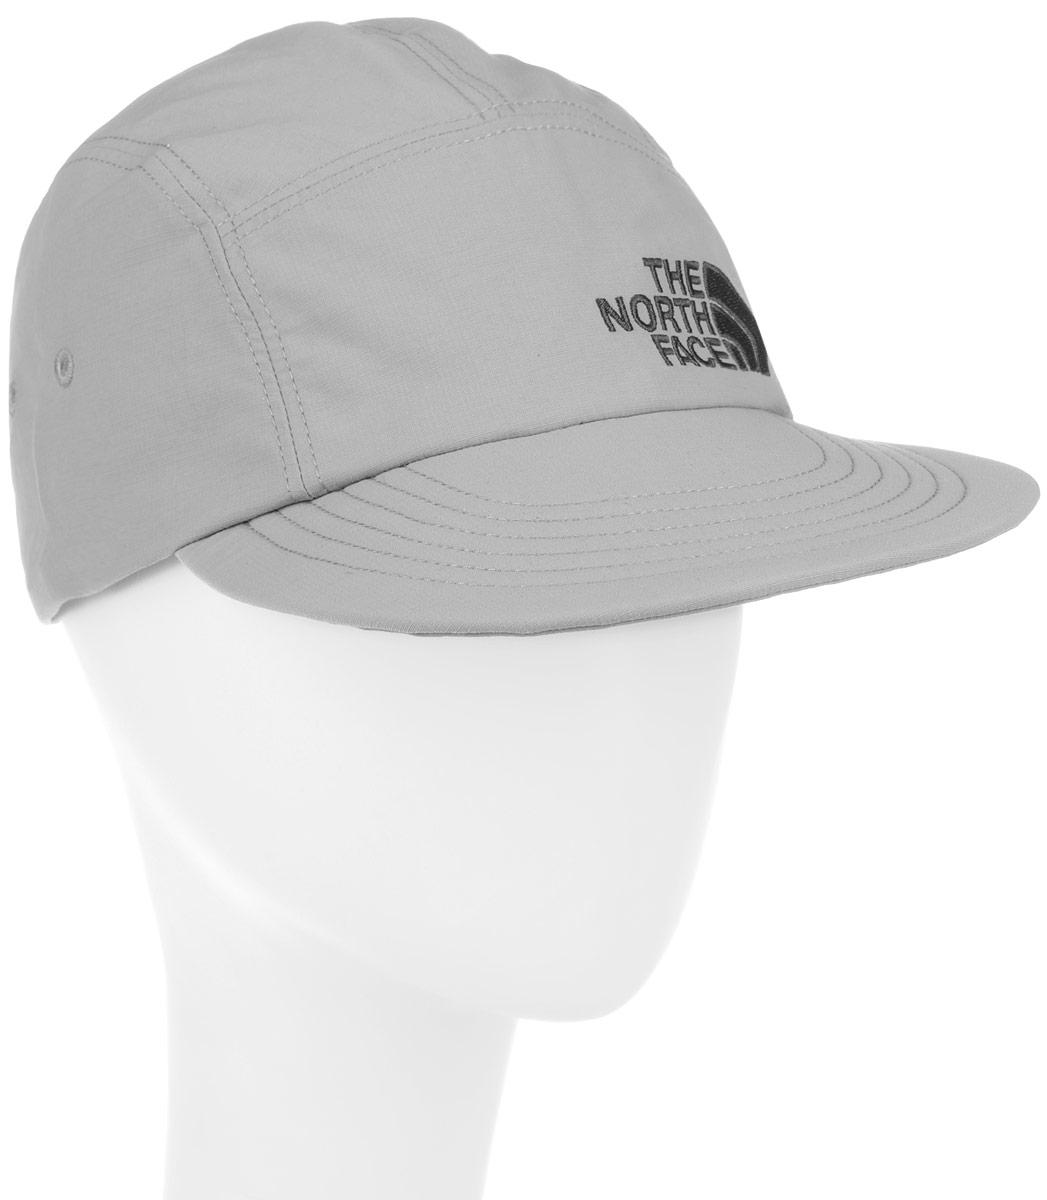 Бейсболка The North Face Horizon Folding Bill Cap, цвет: светло-серый. T0CF7XV3T. Размер универсальный бейсболка the north face mudder trucker hat цвет хаки бежевый t0cgw2scg размер универсальный